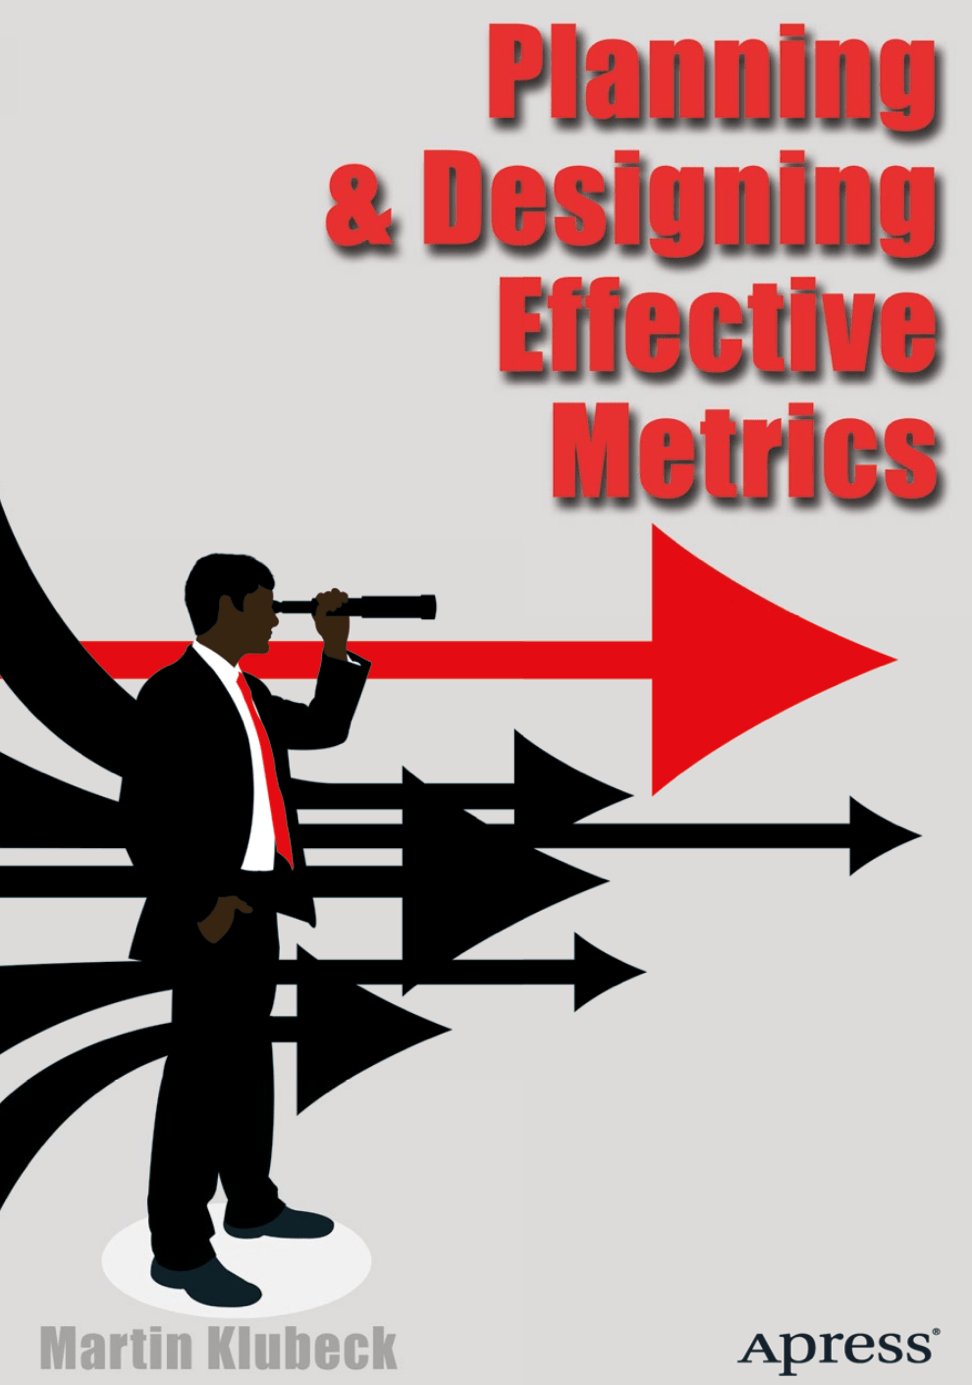 Planning and Designing Effective Metrics at Social-Media.press